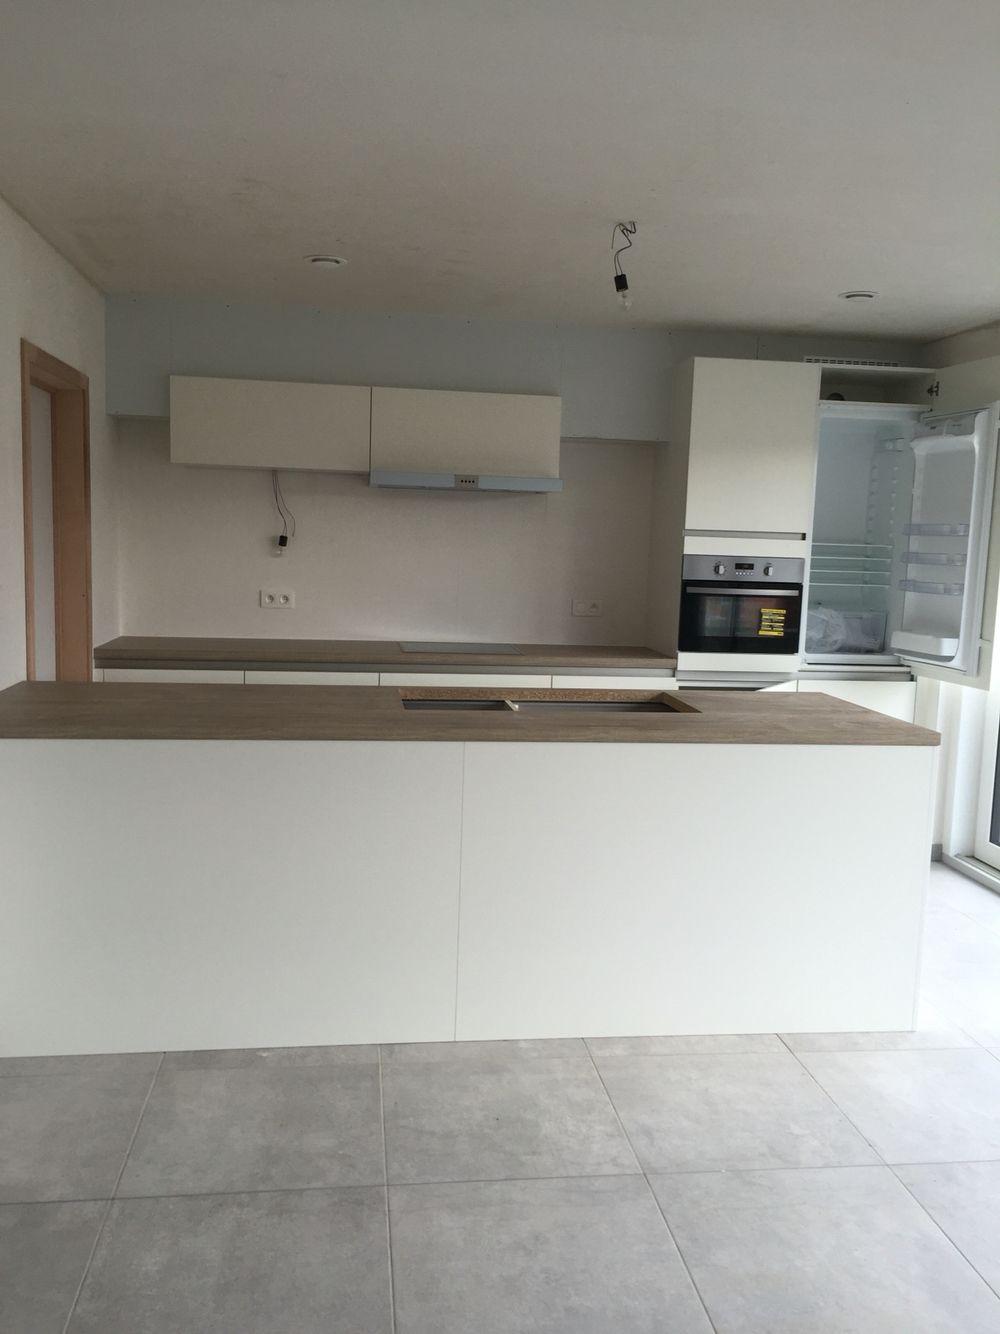 keuken wit eik grijze vloer wand decoratie pinterest grijze